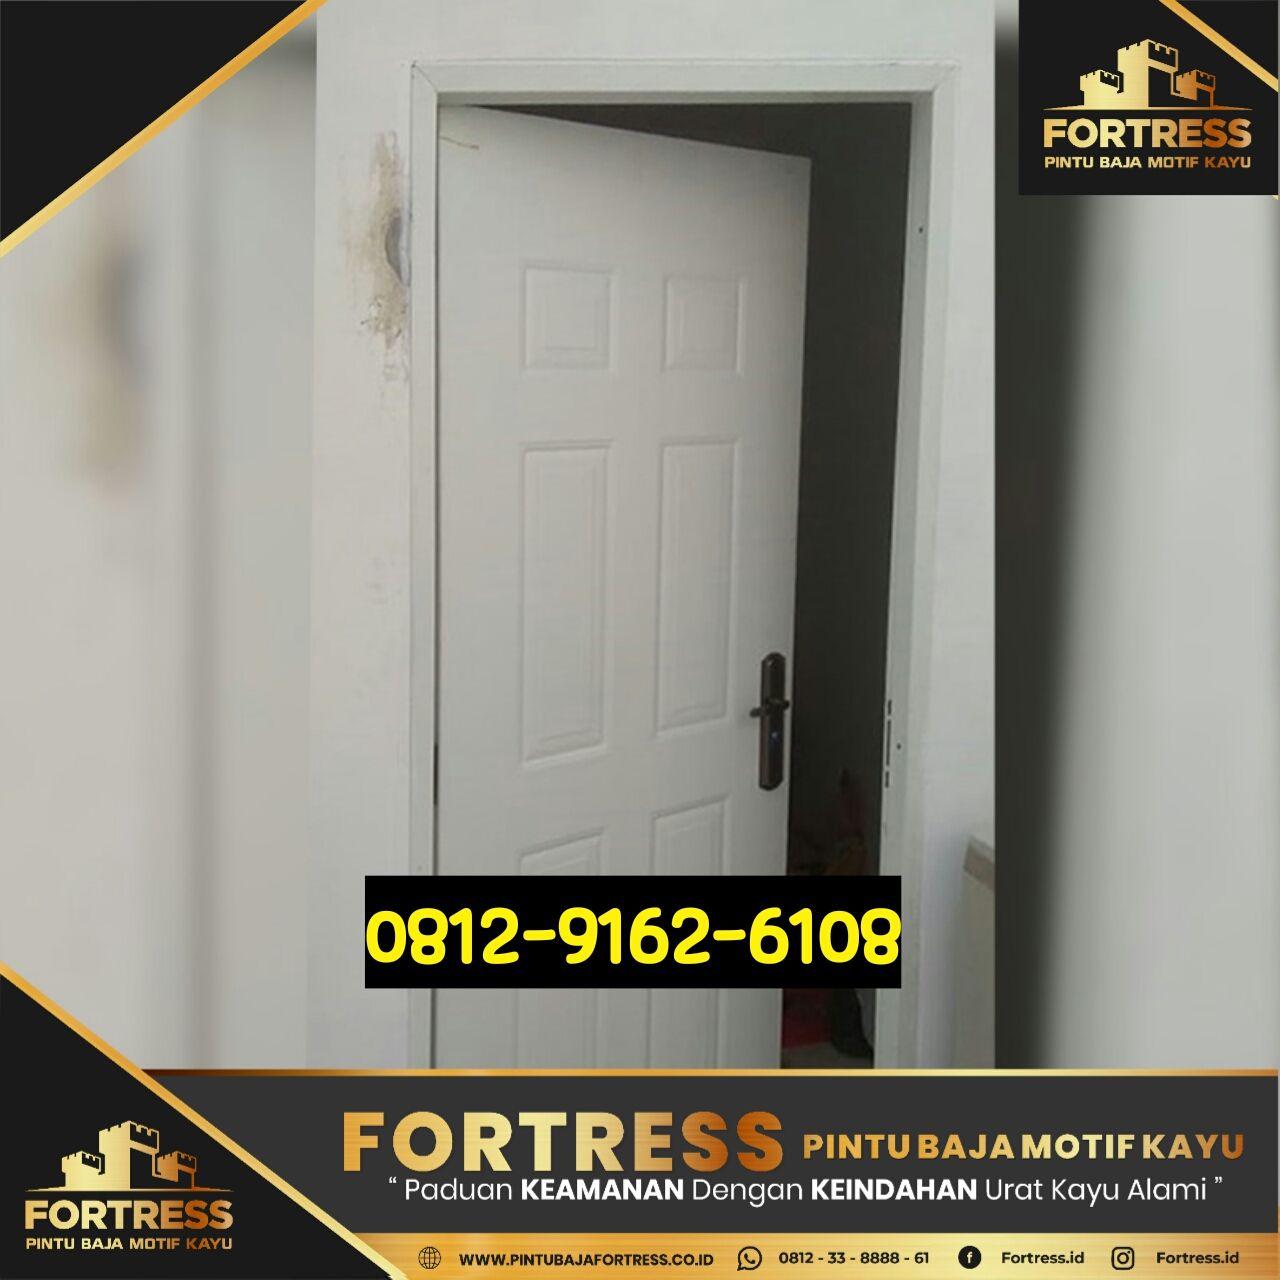 0812-9162-6105 (FOTRESS), lightweight steel gates, door g …